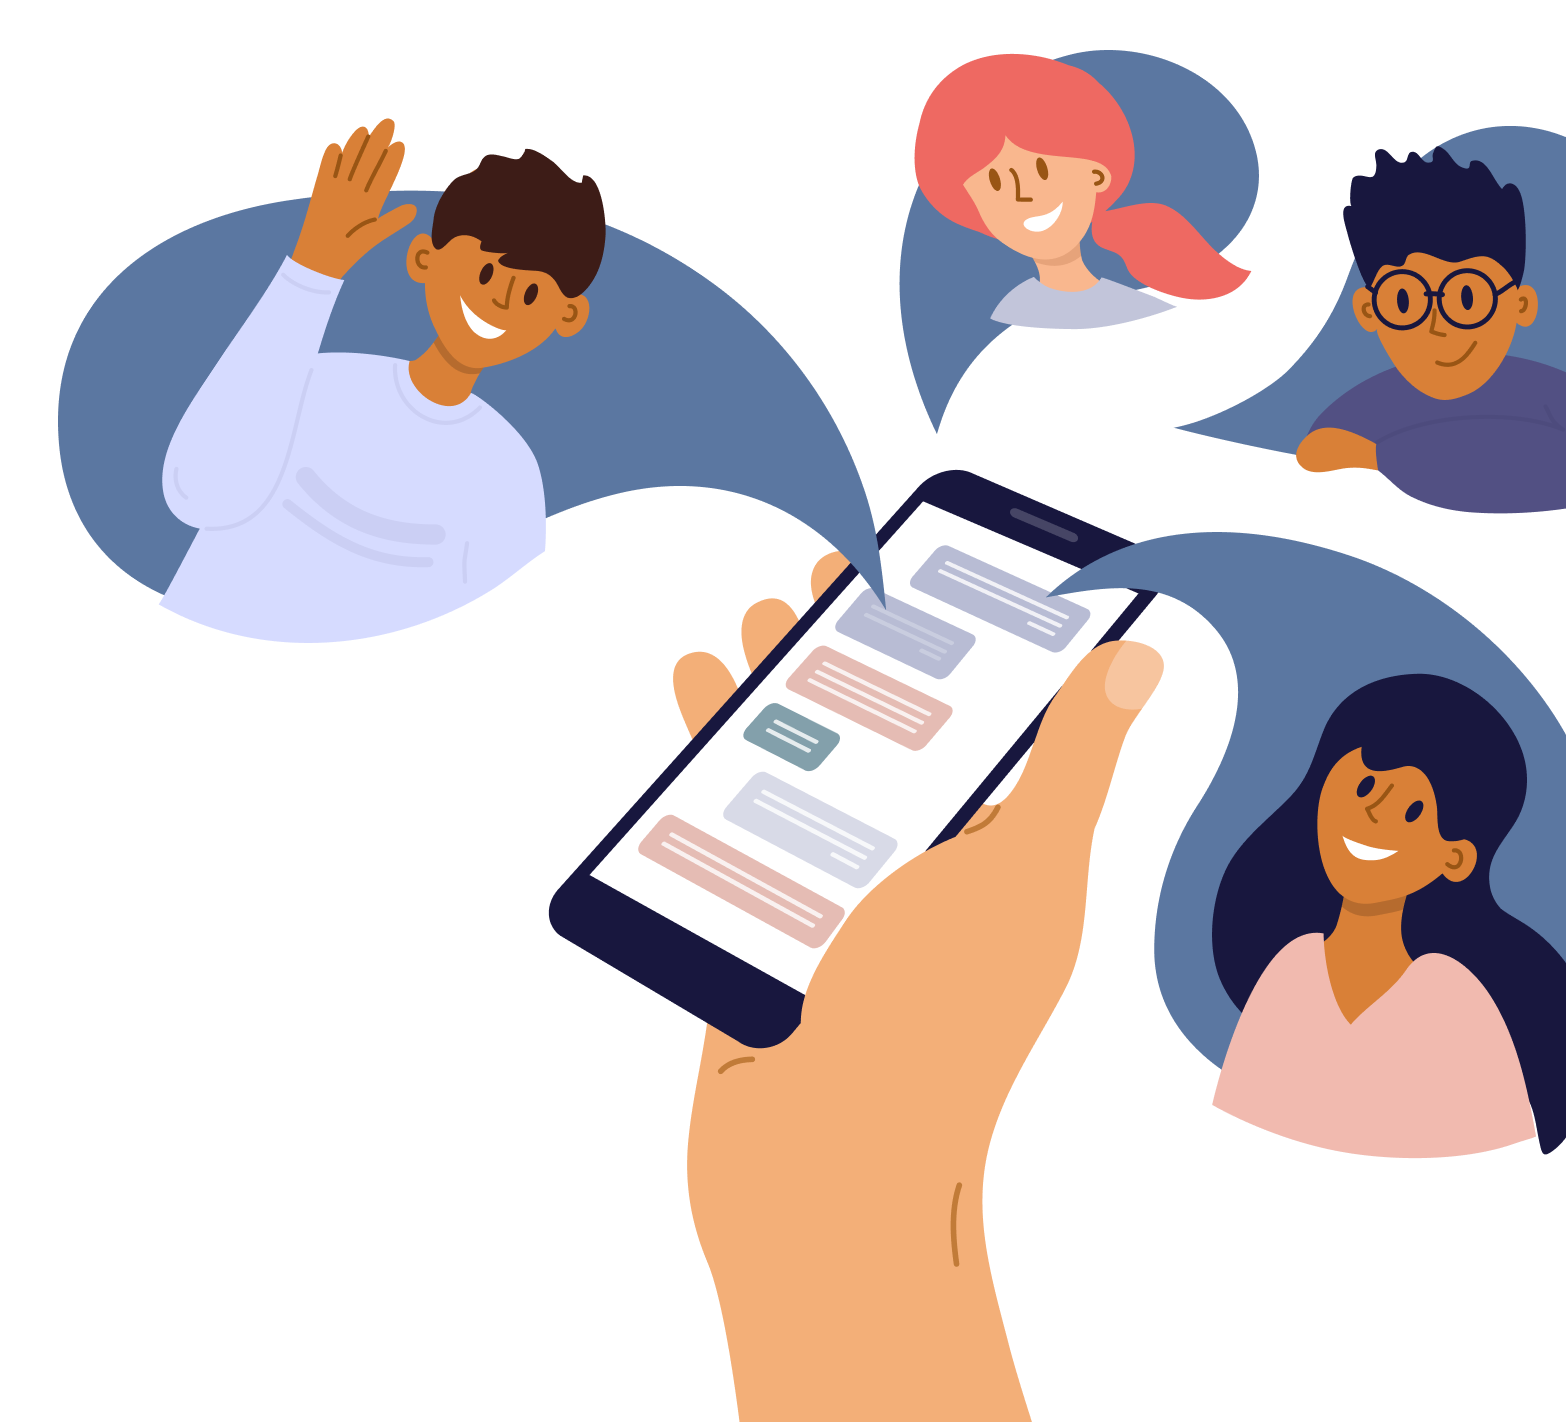 Text message speech bubble illustration